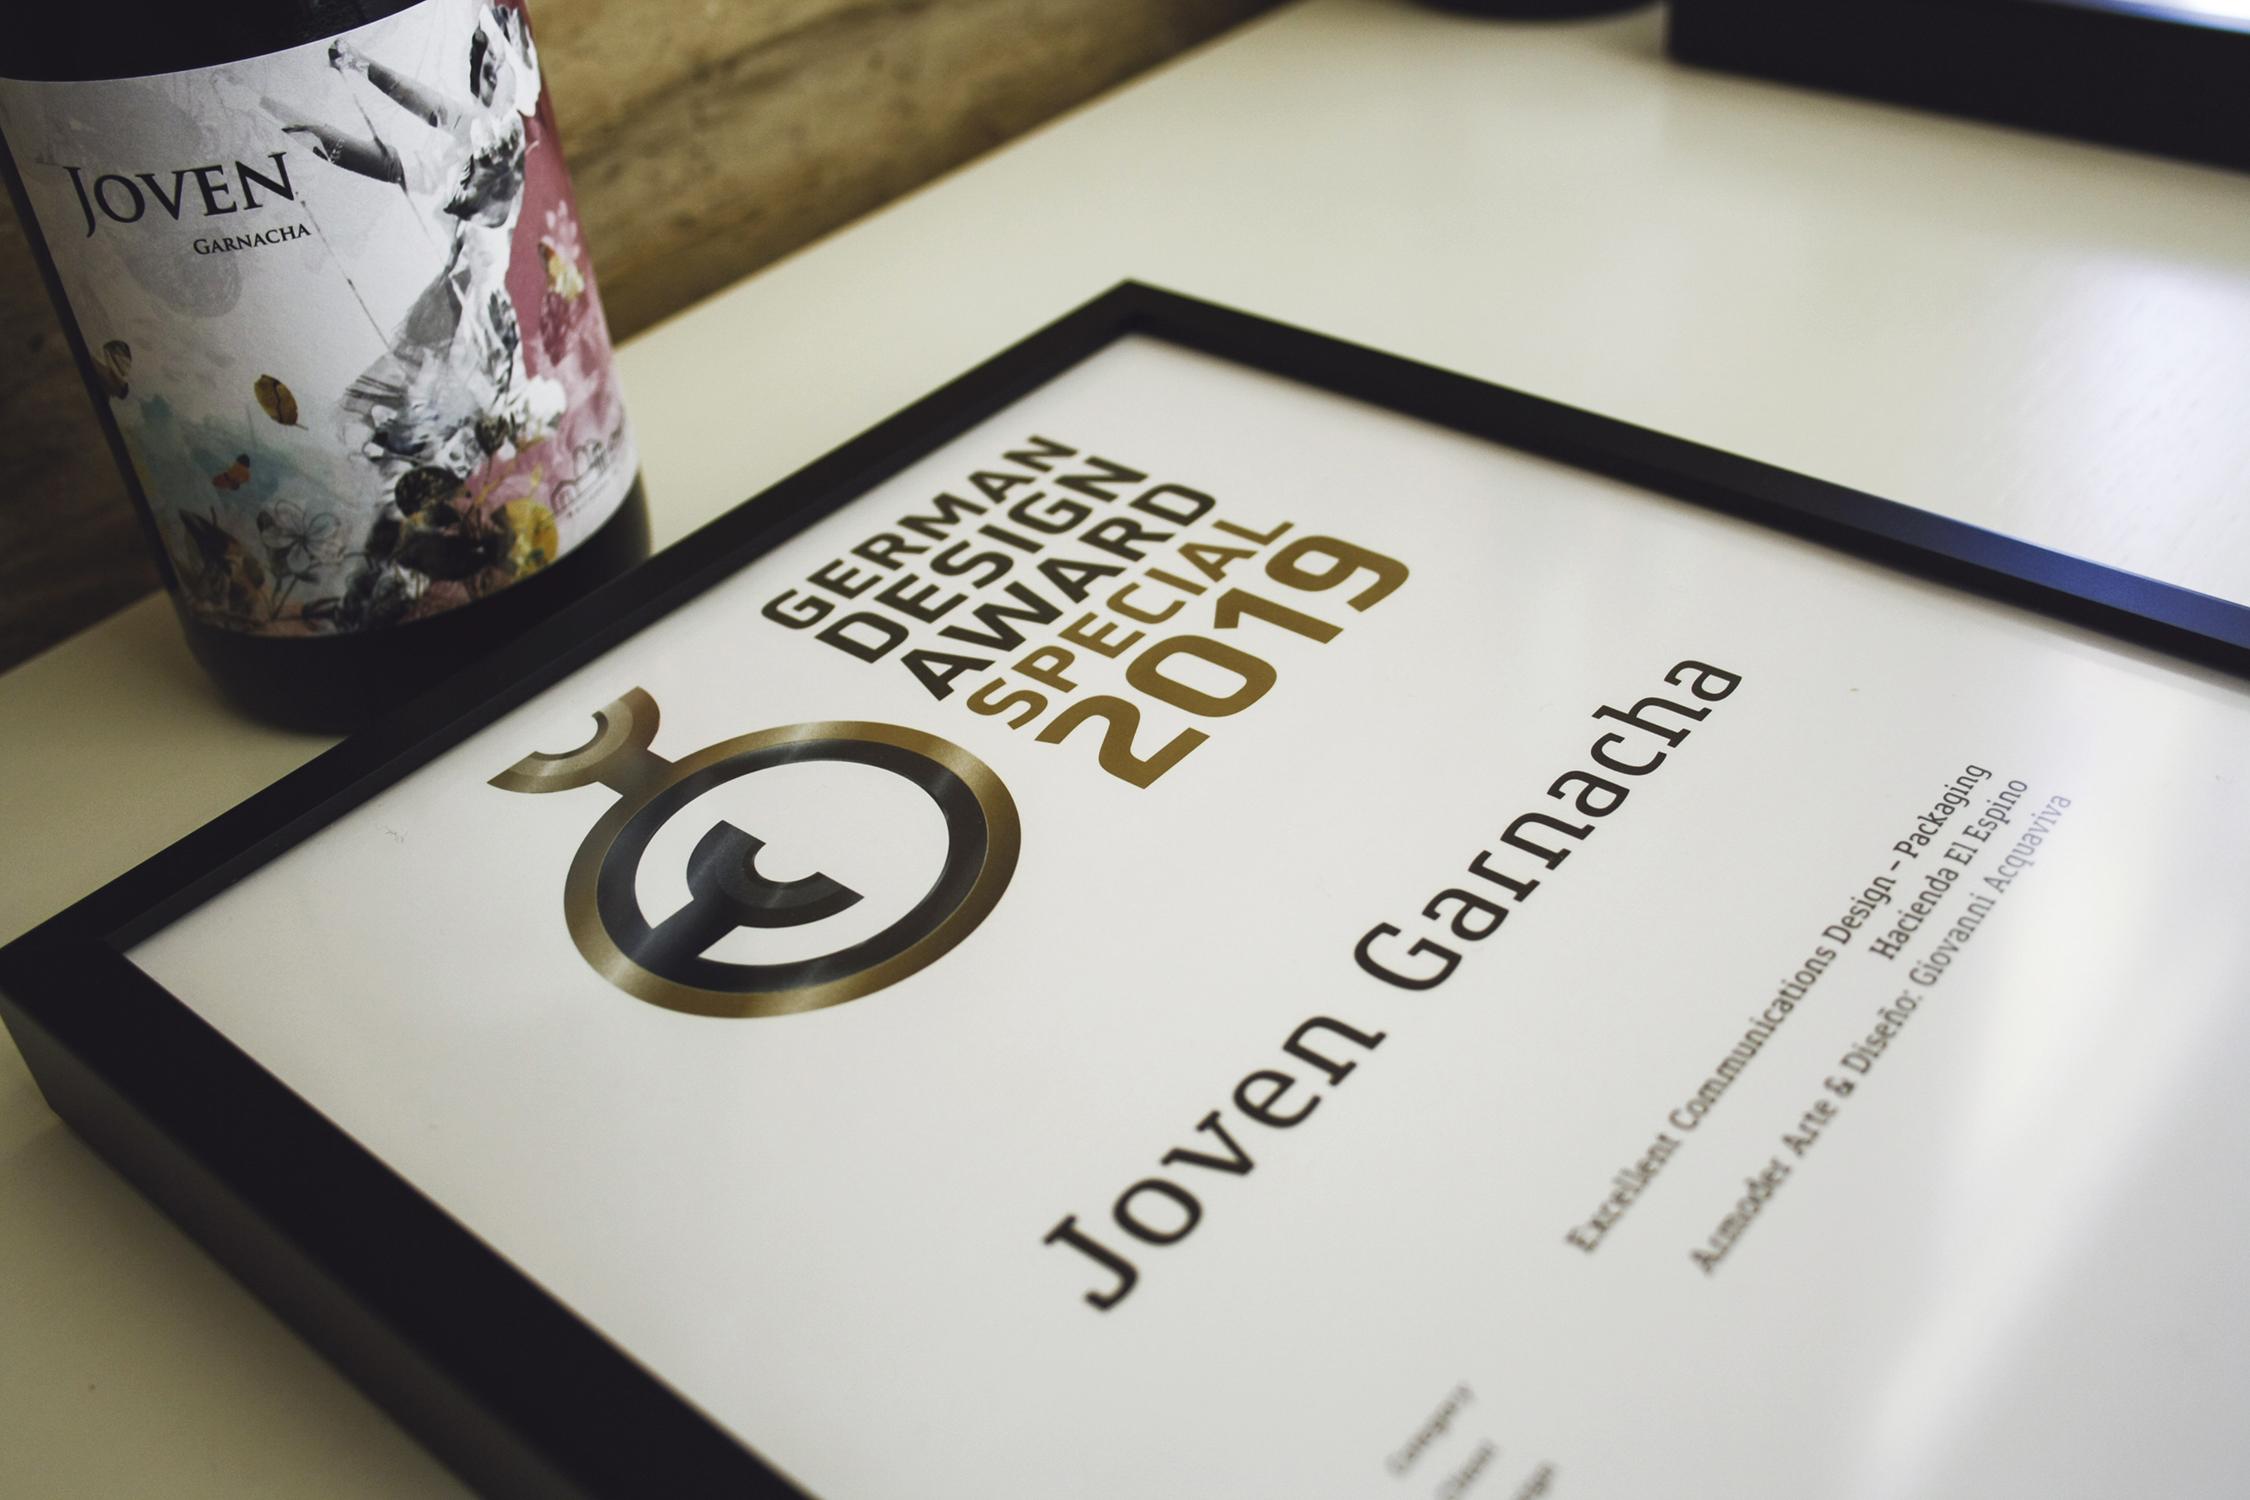 Armoder Arte y Diseño German Design Award